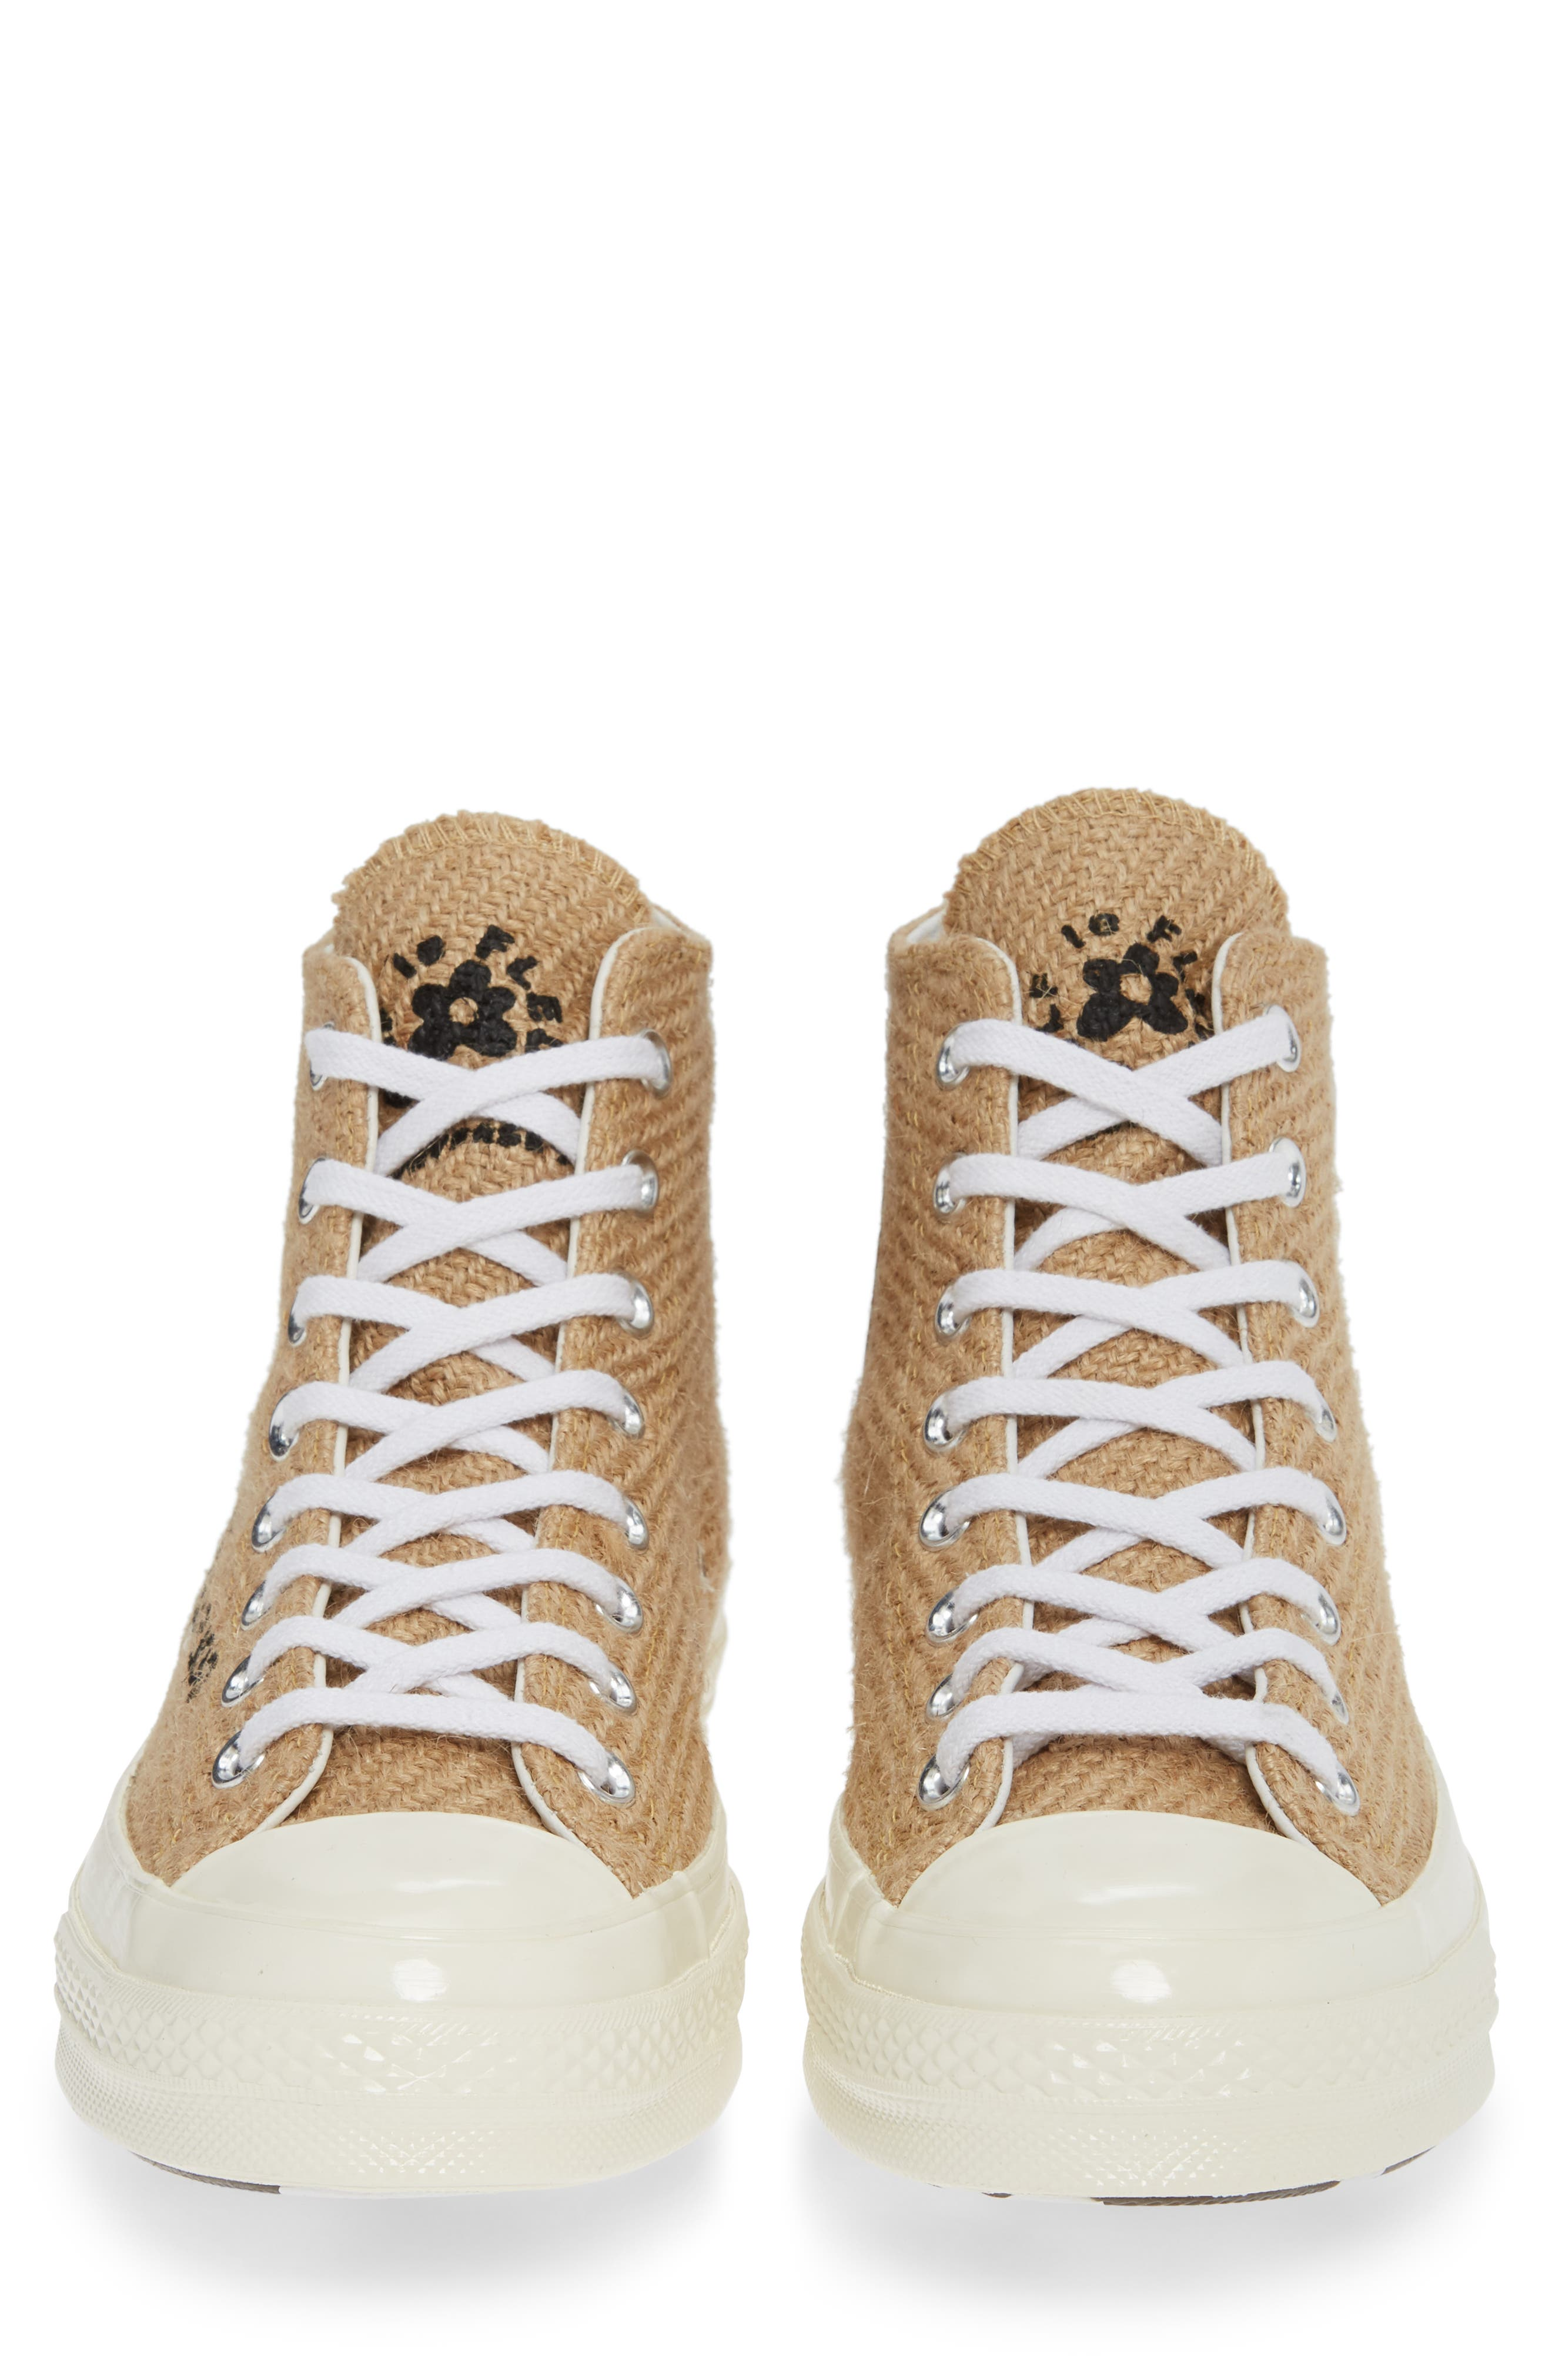 x GOLF le FLEUR* Chuck 70 High Top Sneaker,                             Alternate thumbnail 4, color,                             209